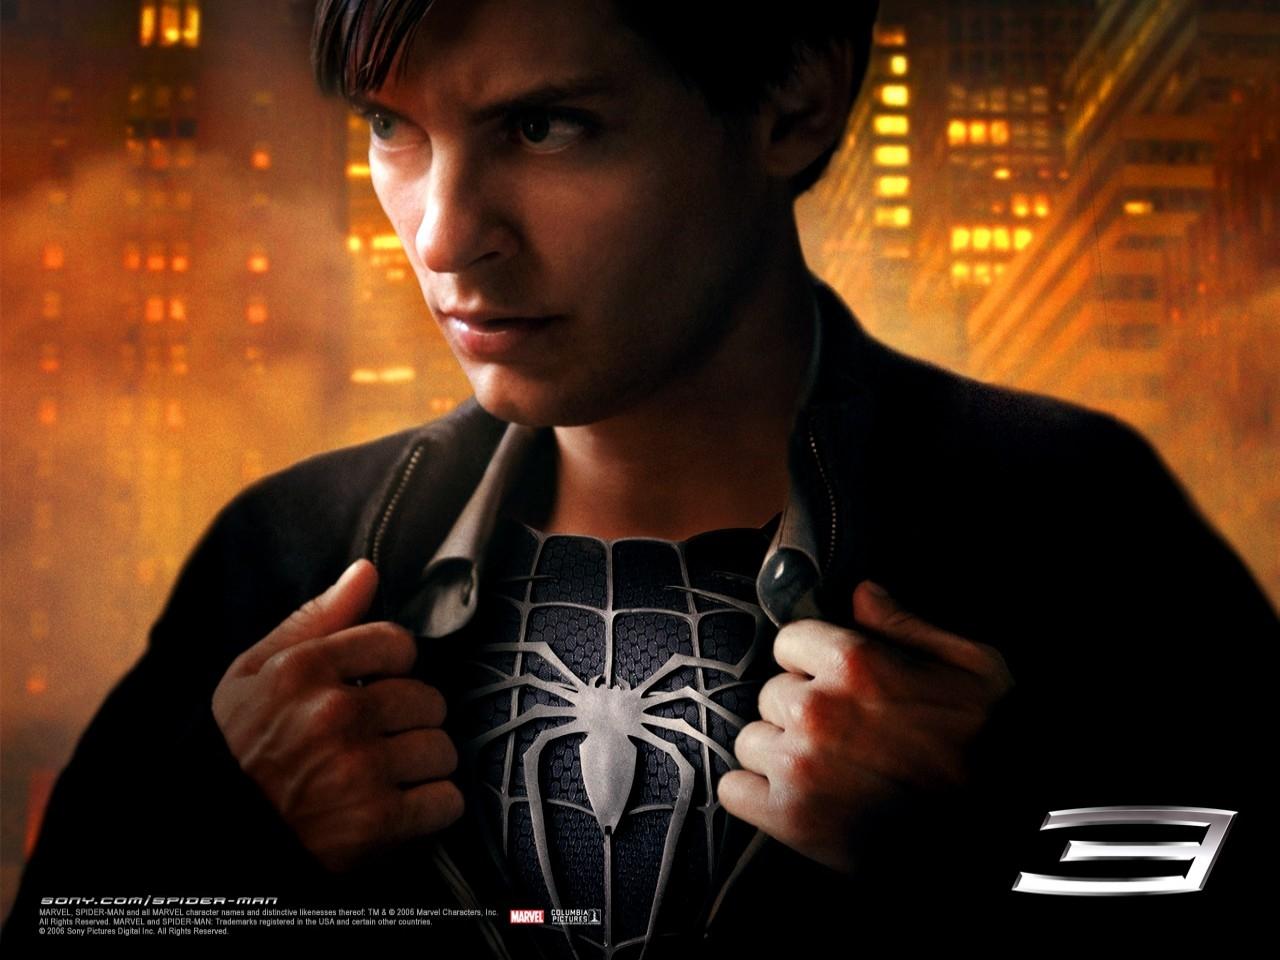 Wallpaper del film Spider-Man 3